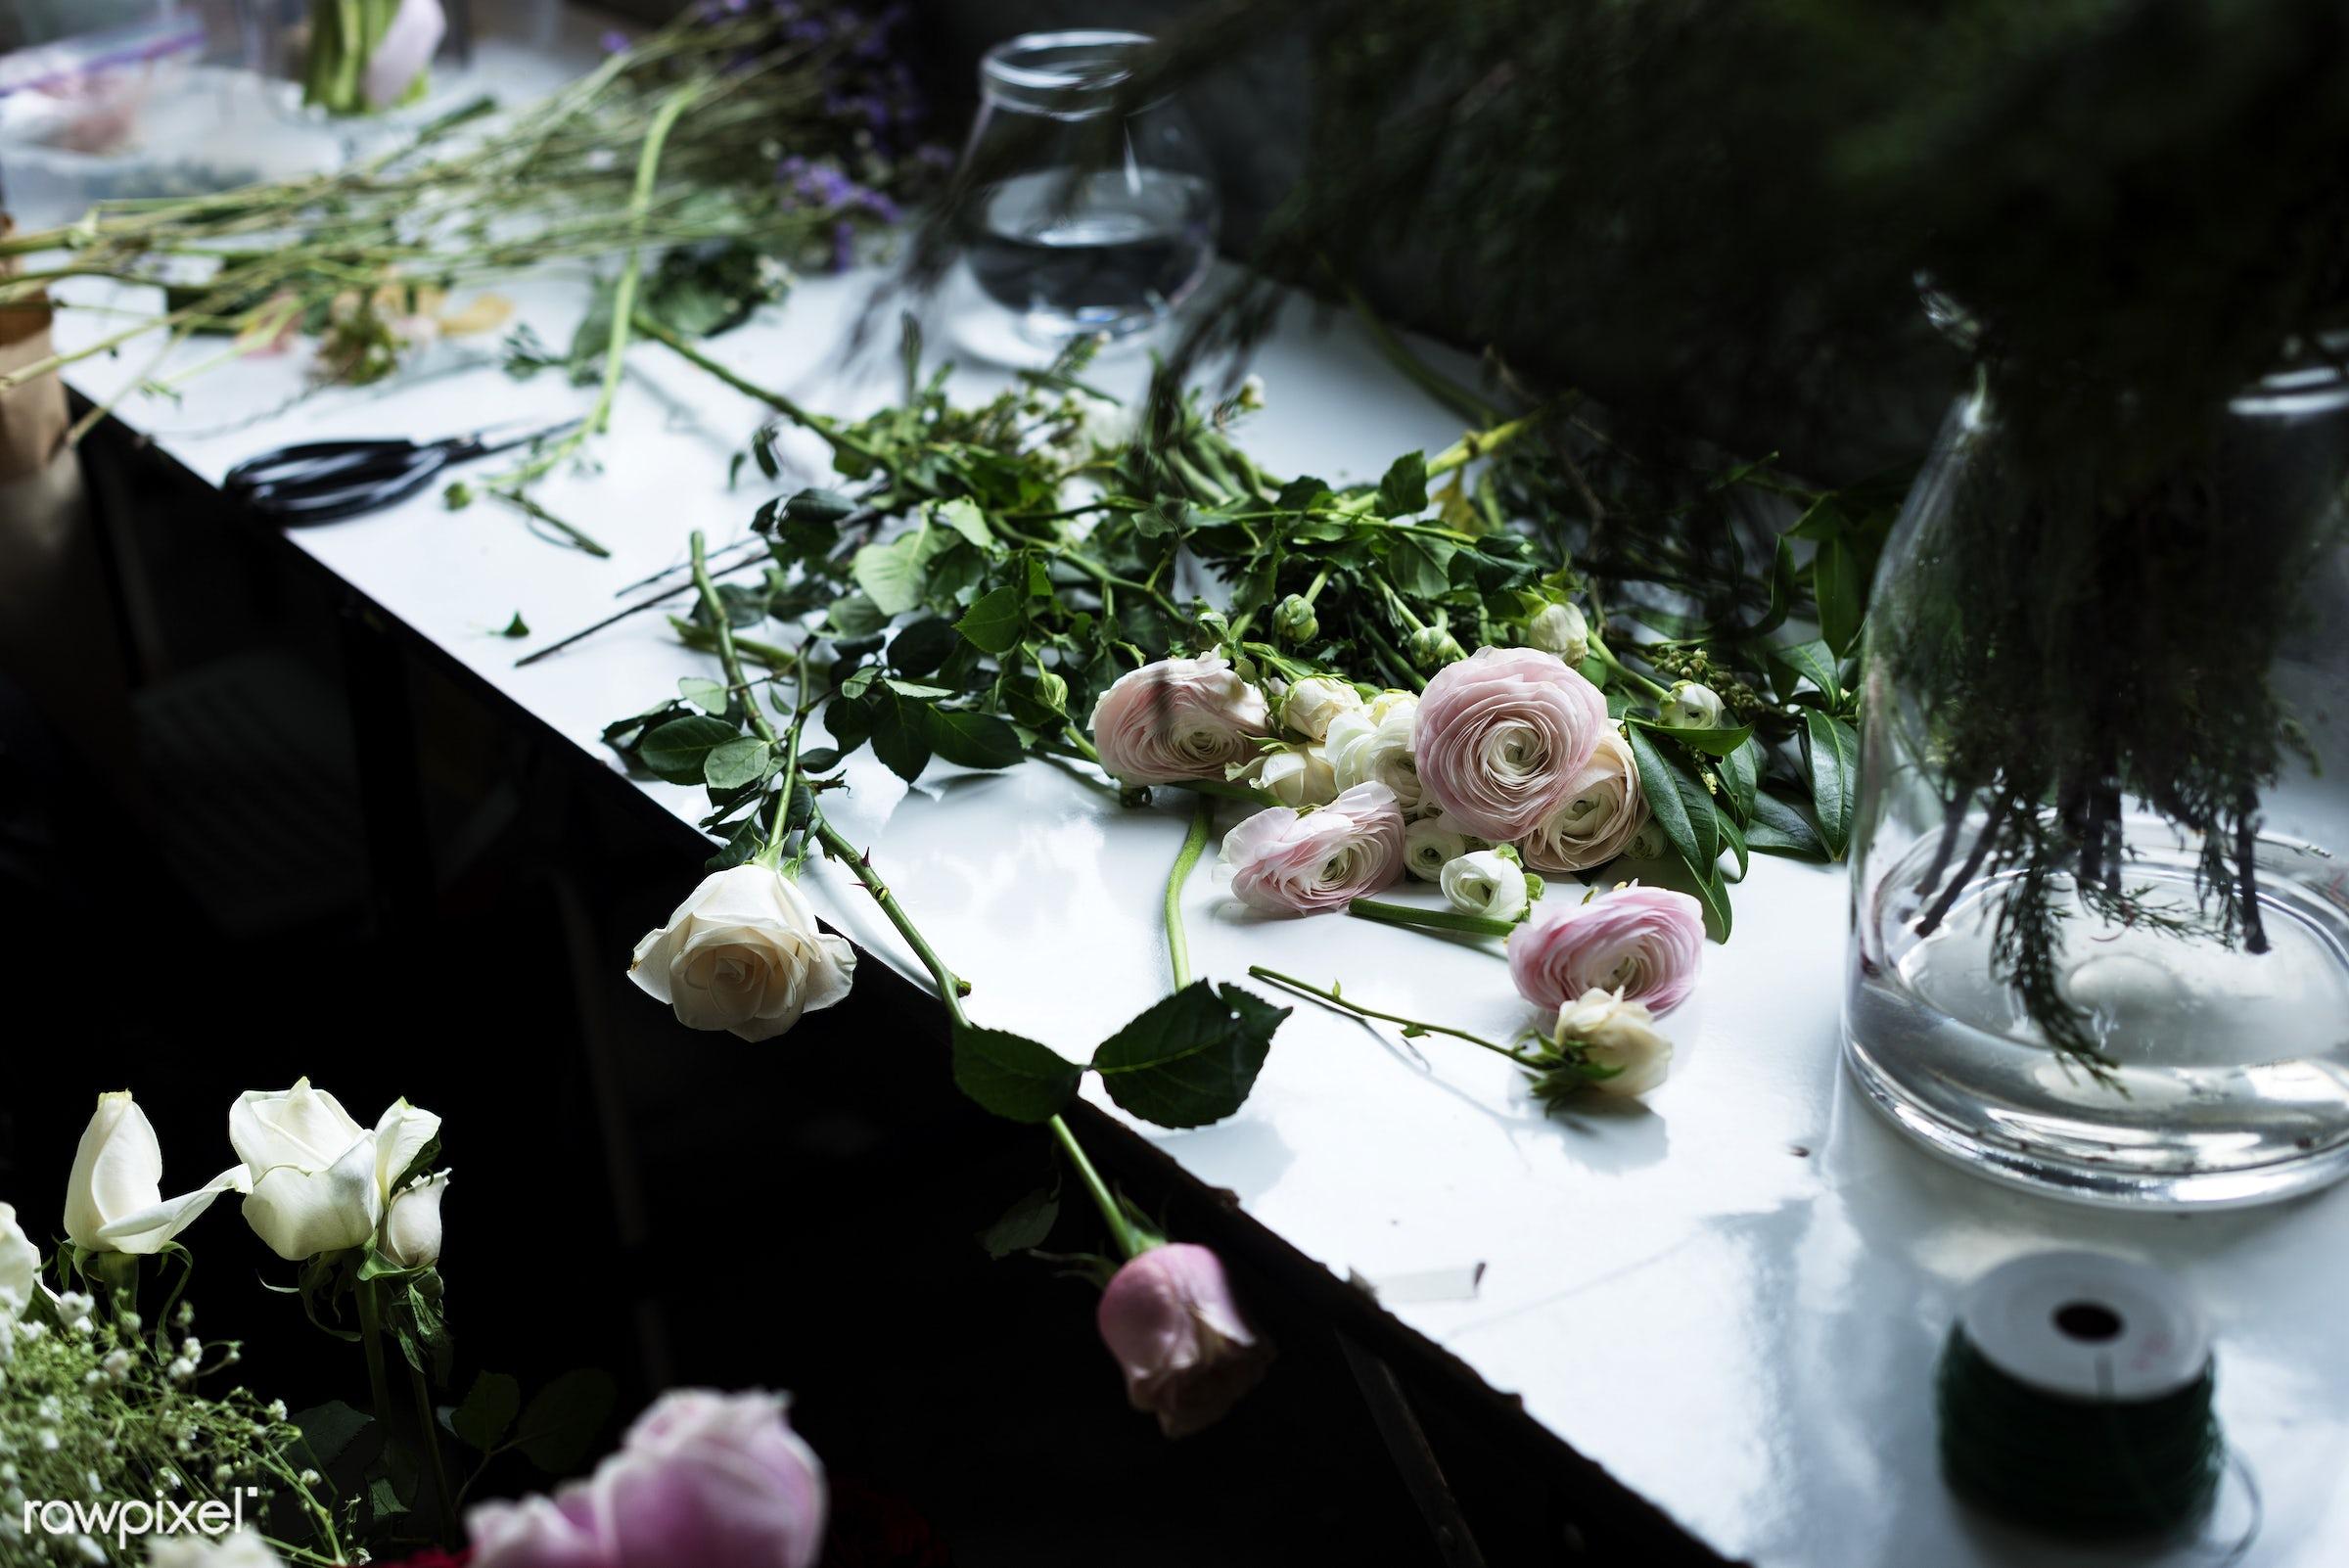 Fresh Roses Flowers Arrangement Decorative - spring, florist, floral, rose, arrangement, attractive, beautiful, bloom,...